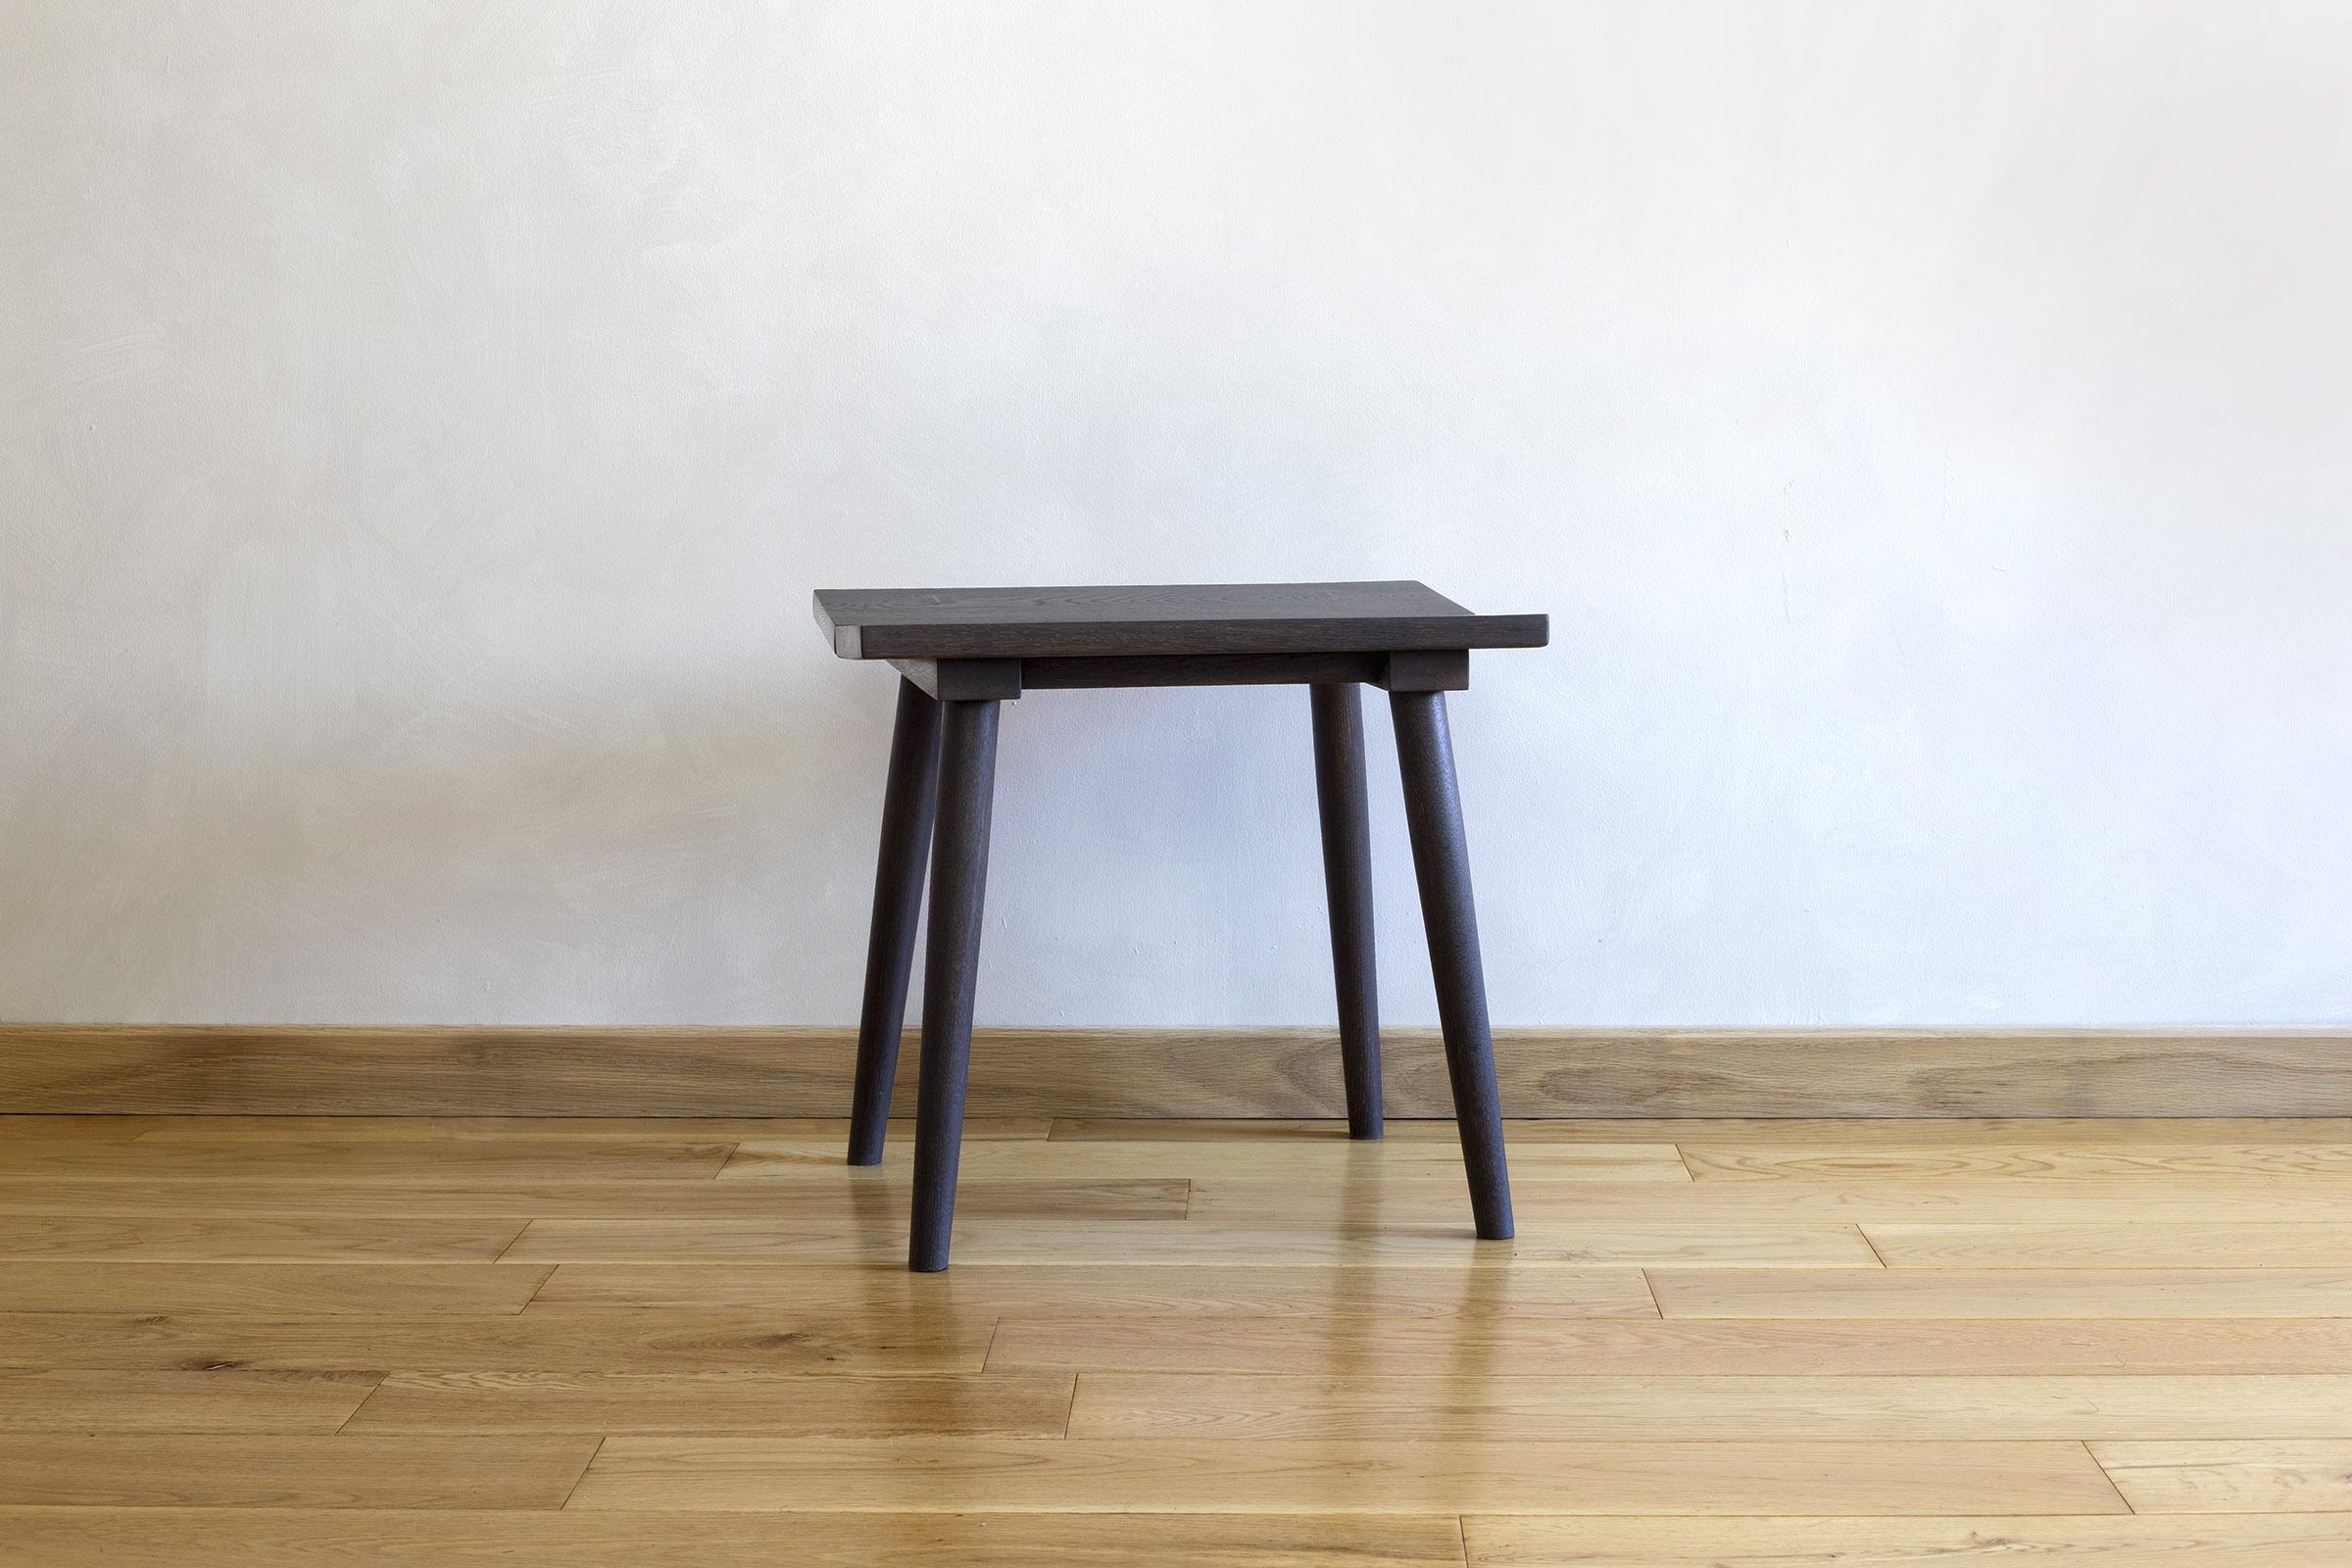 Marlow_stool.jpg